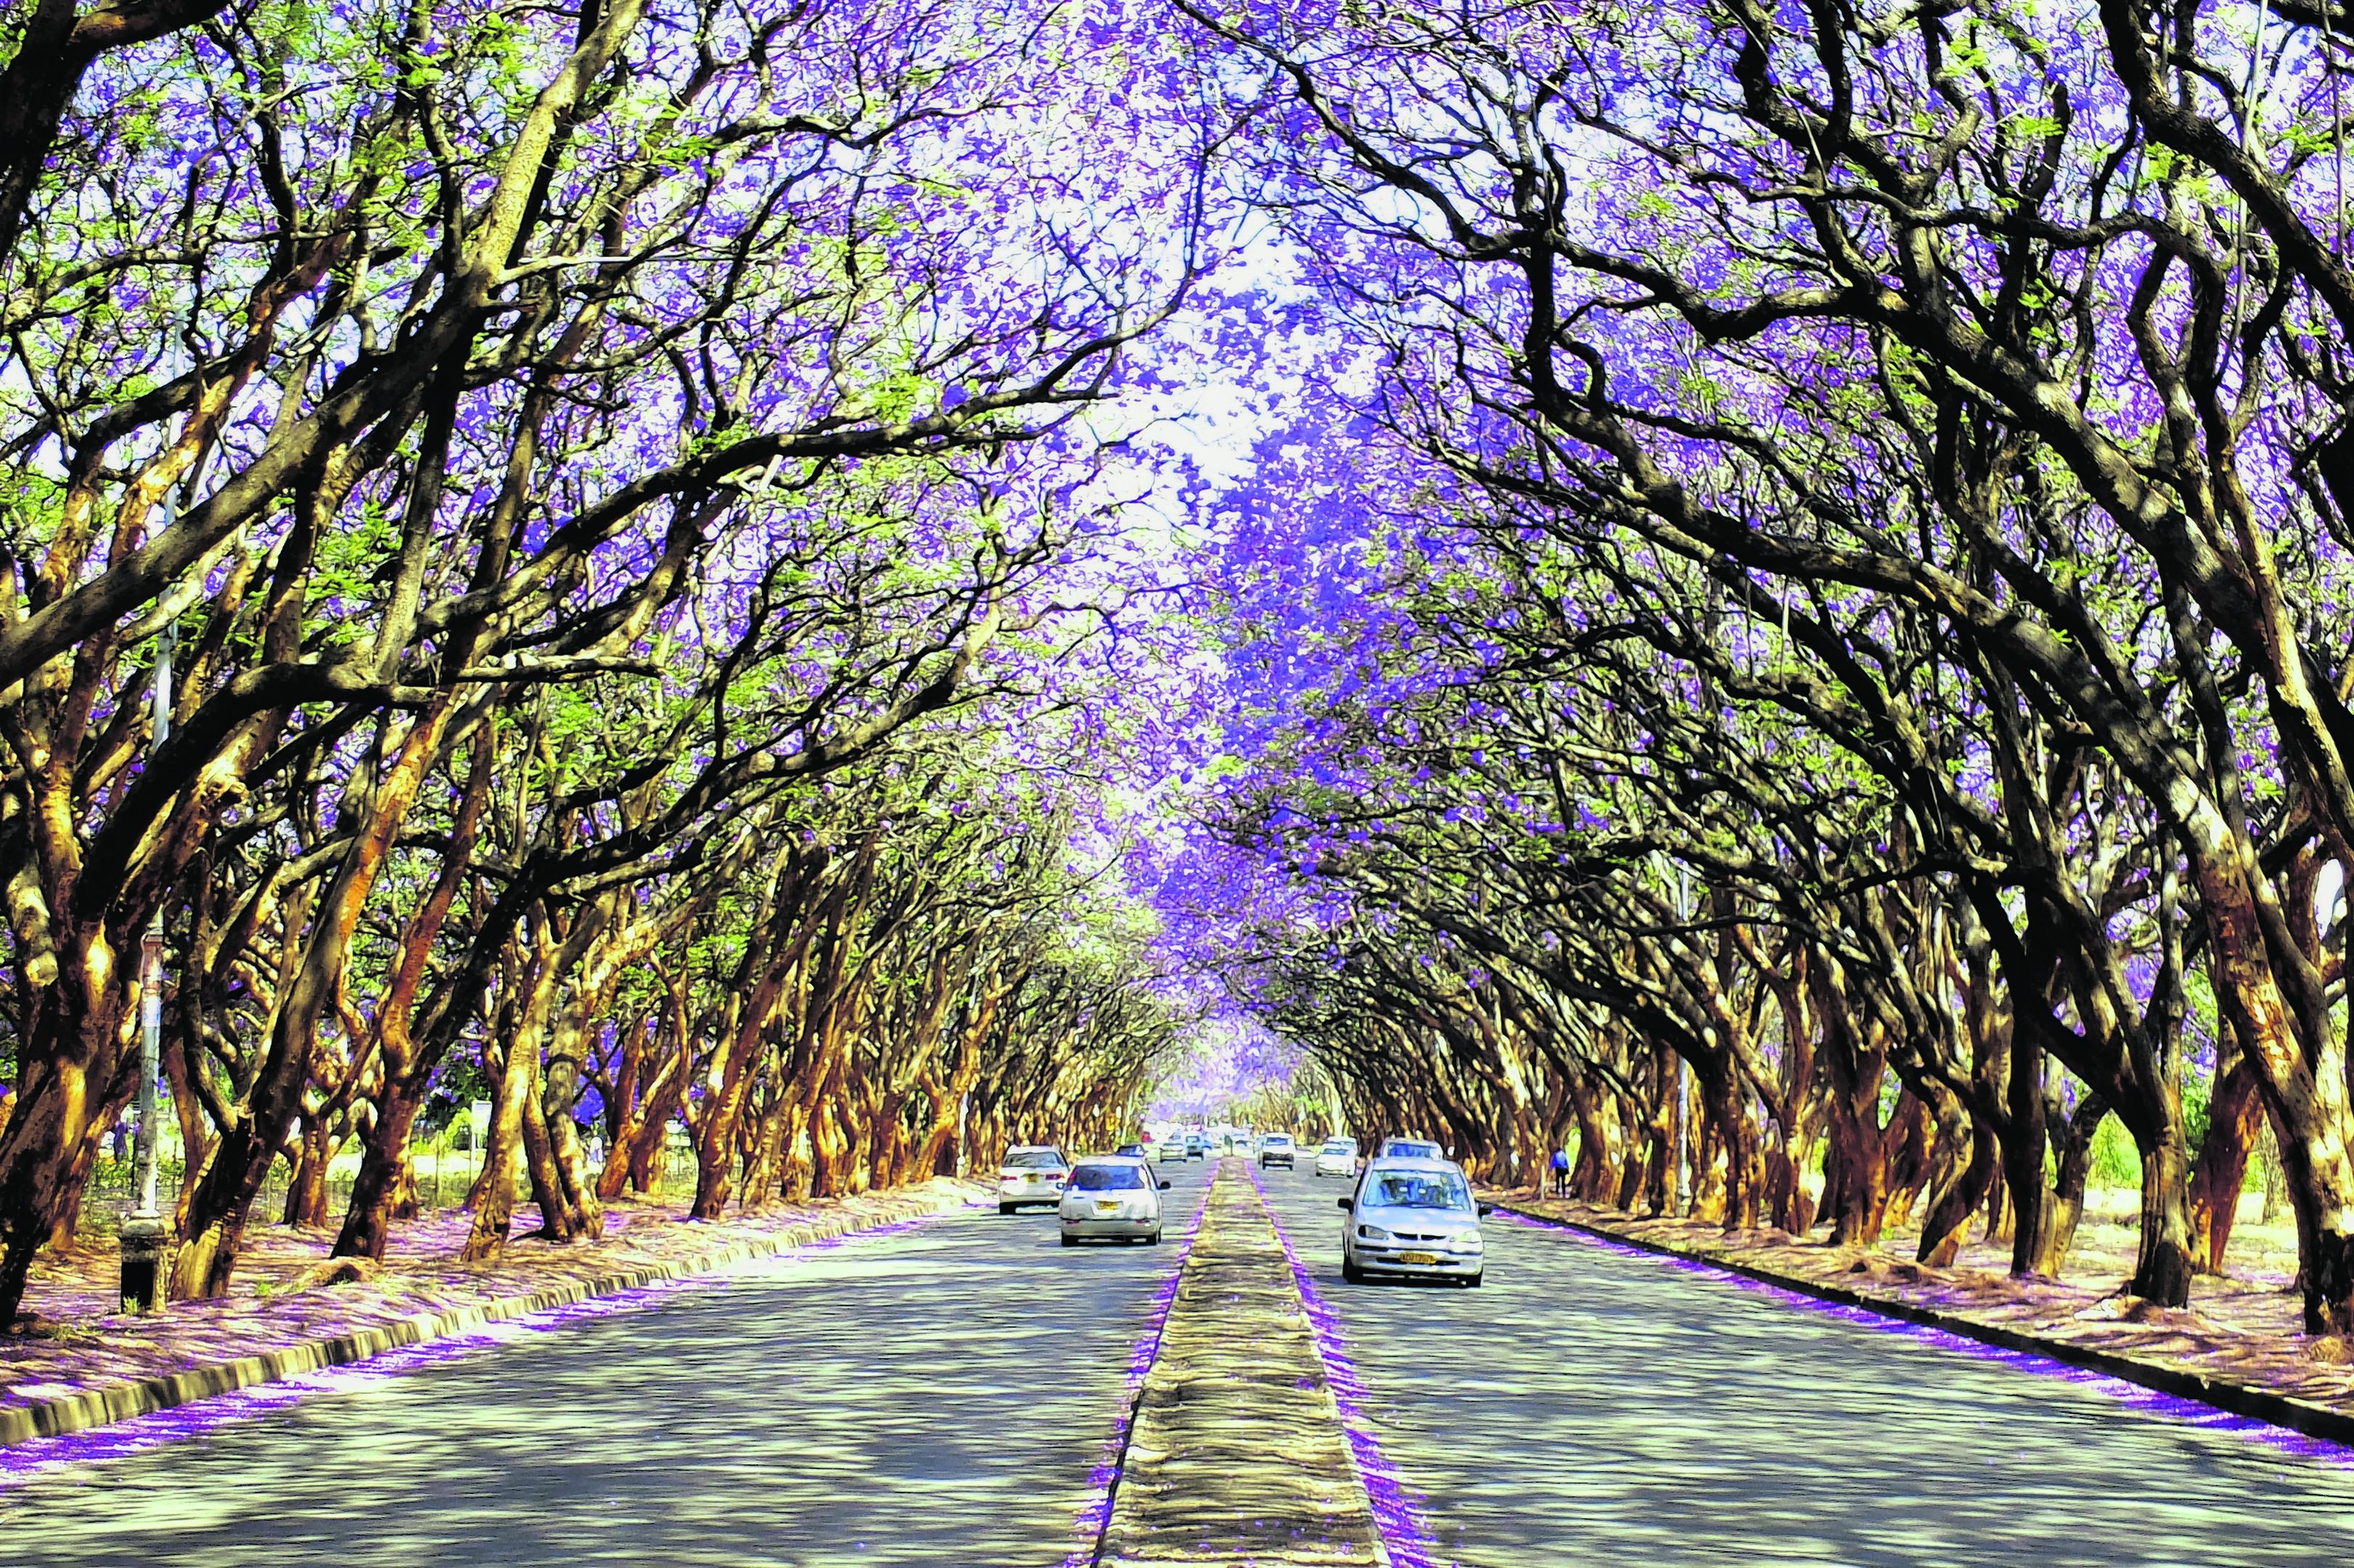 Blooming Jacaranda trees on the streets of Harare, Zimbabwe